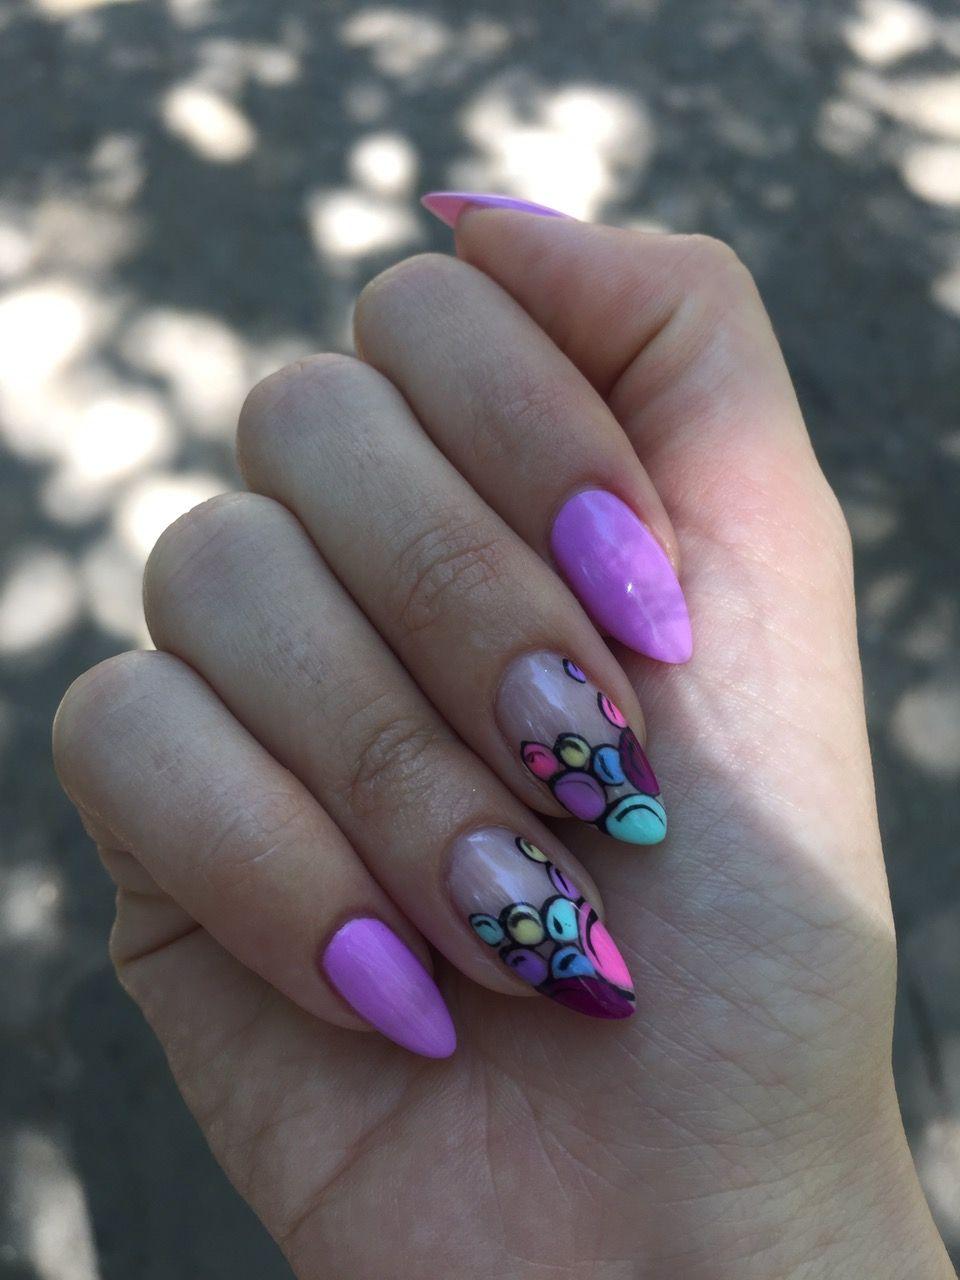 #nails #nailsdecoration #manicure #almondmanicure #almondanails #purplenails